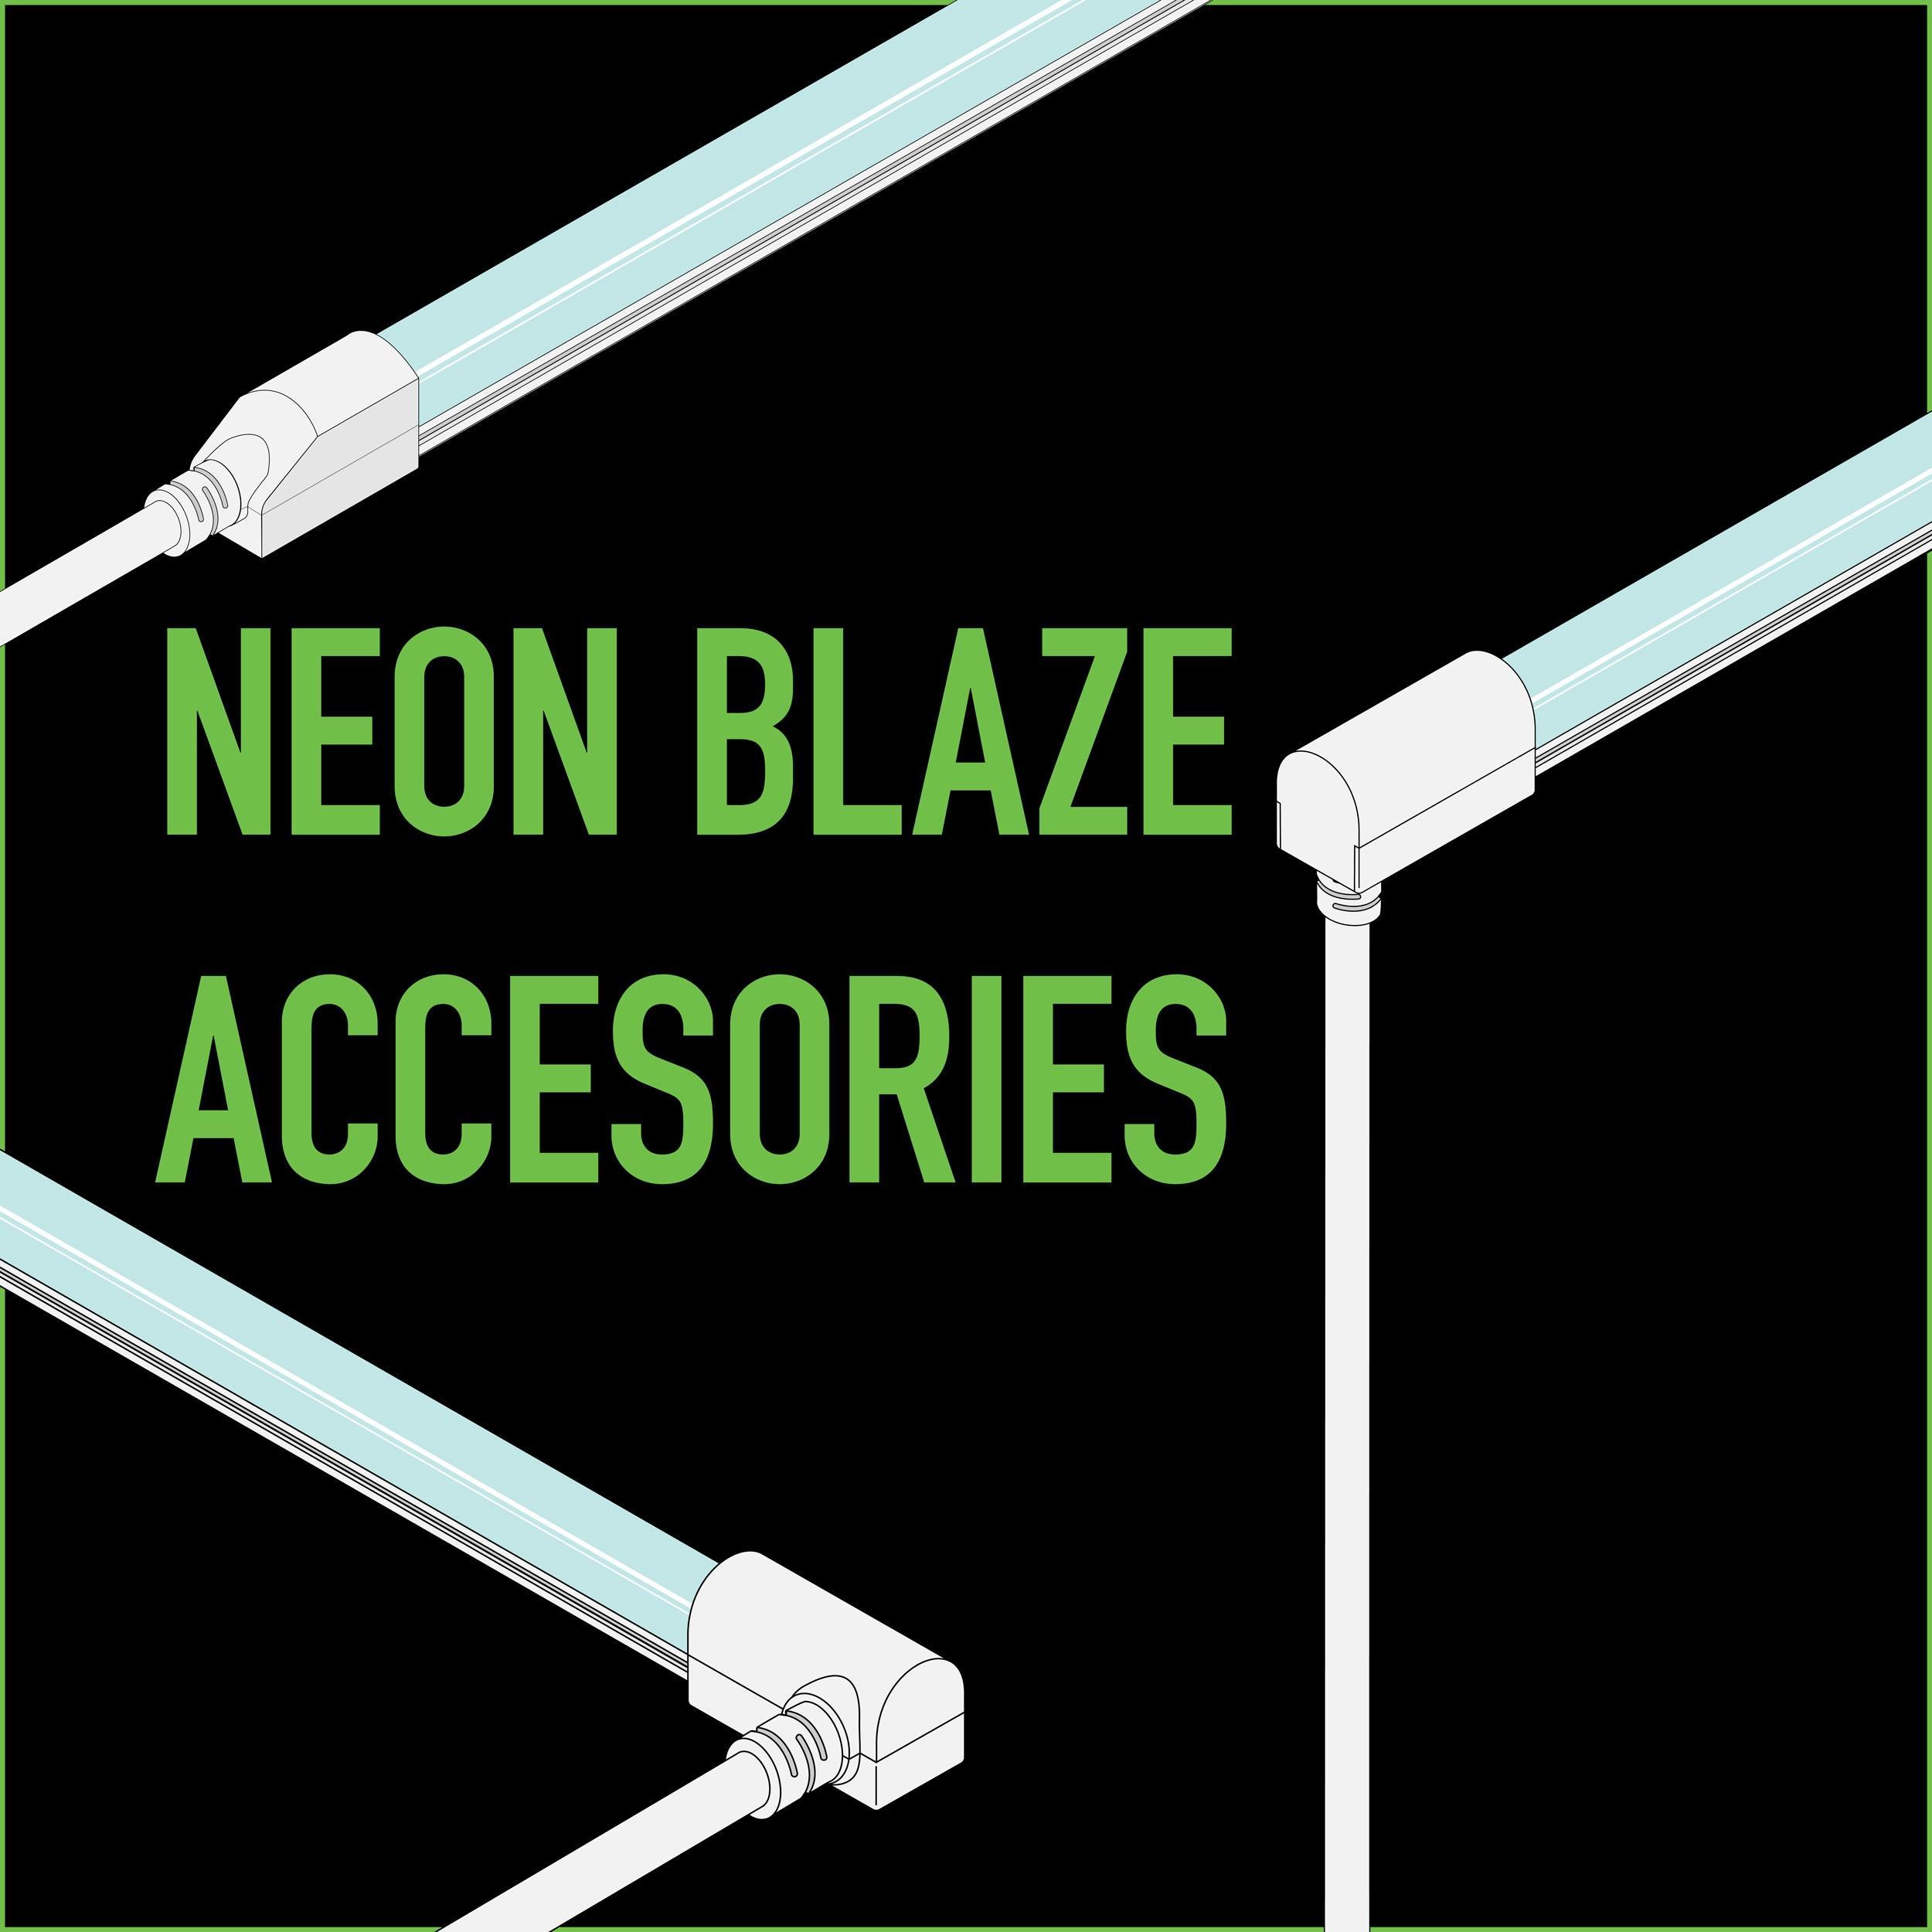 NEON BLAZE Accessories